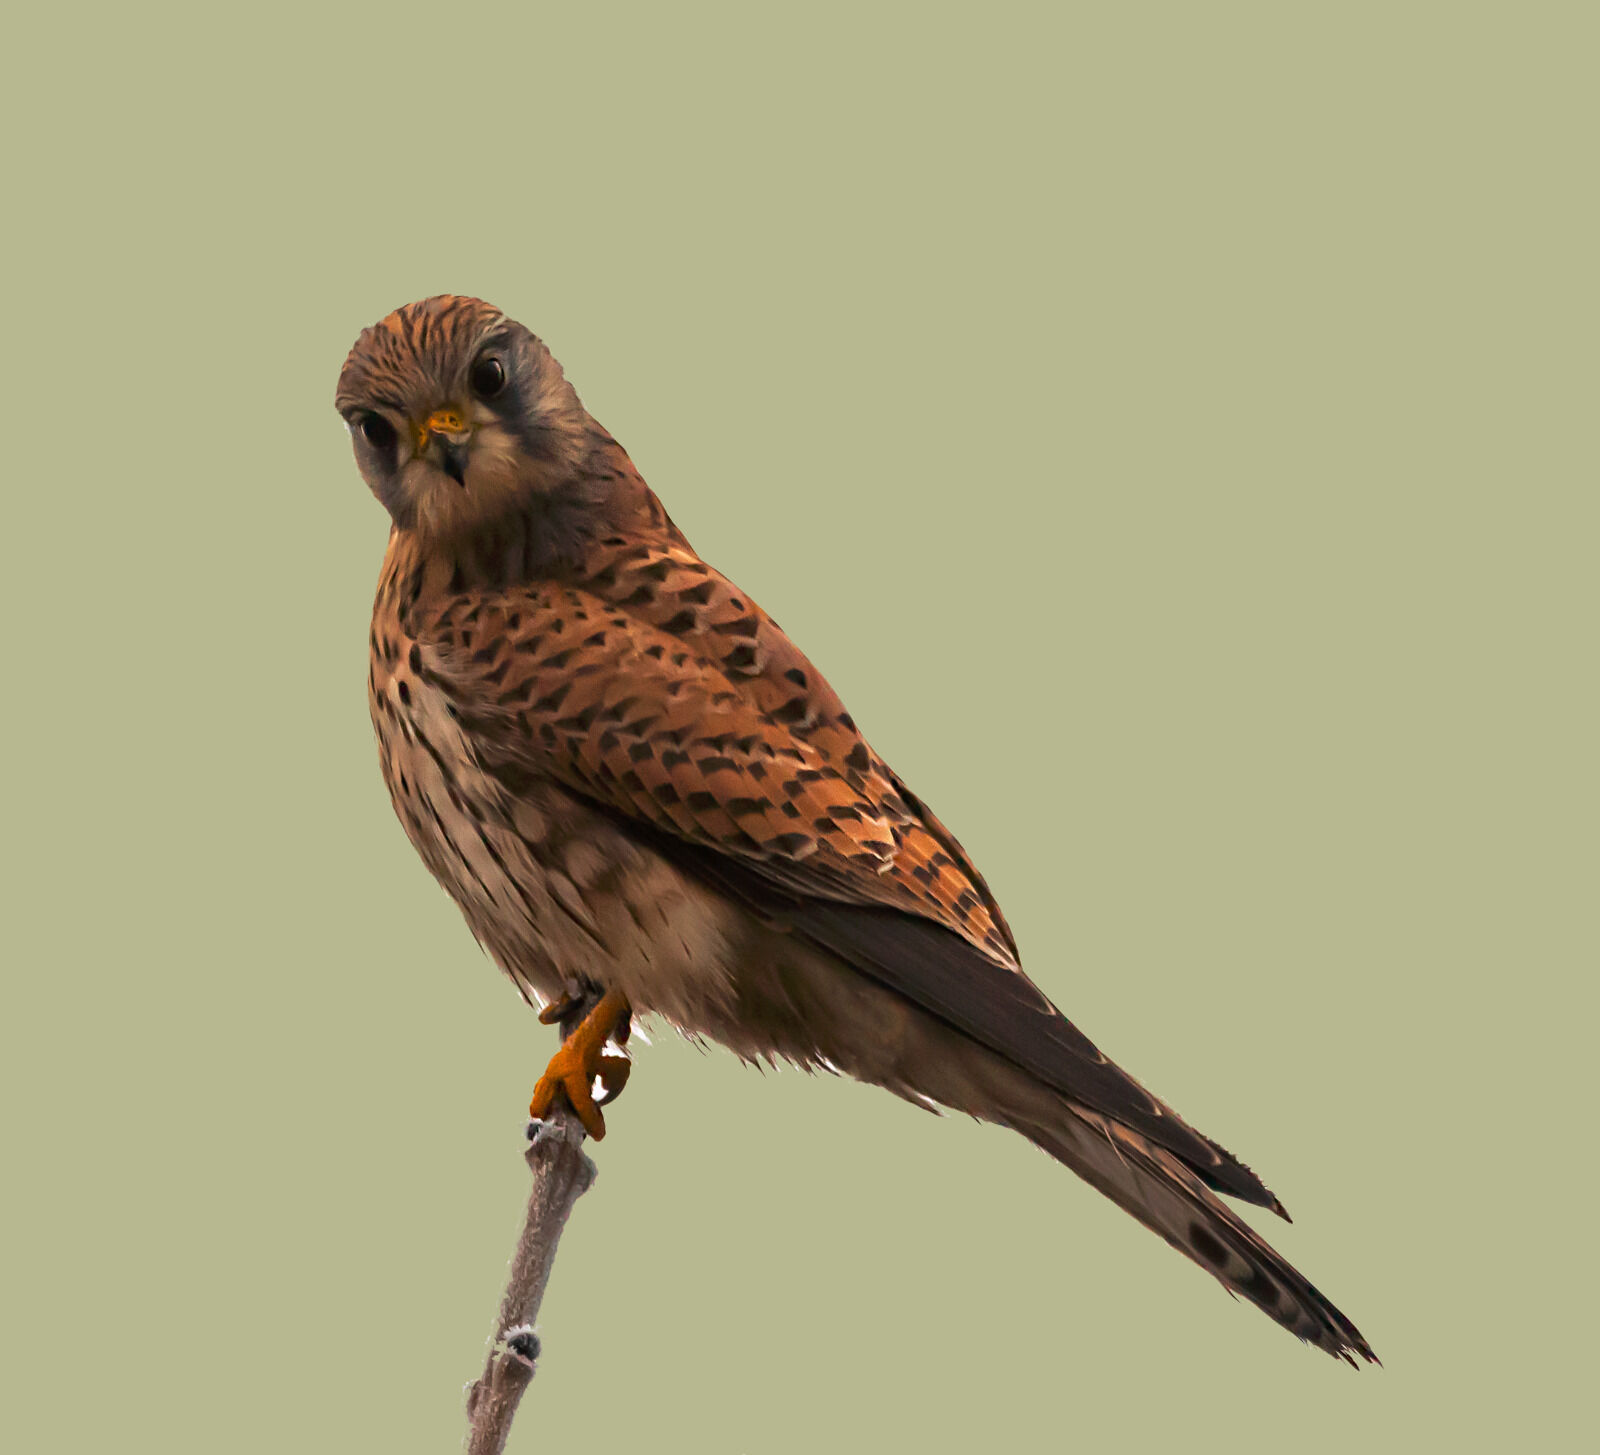 Group C - Second - Kestrel (Falco Tinnunculus) - Frank Lock